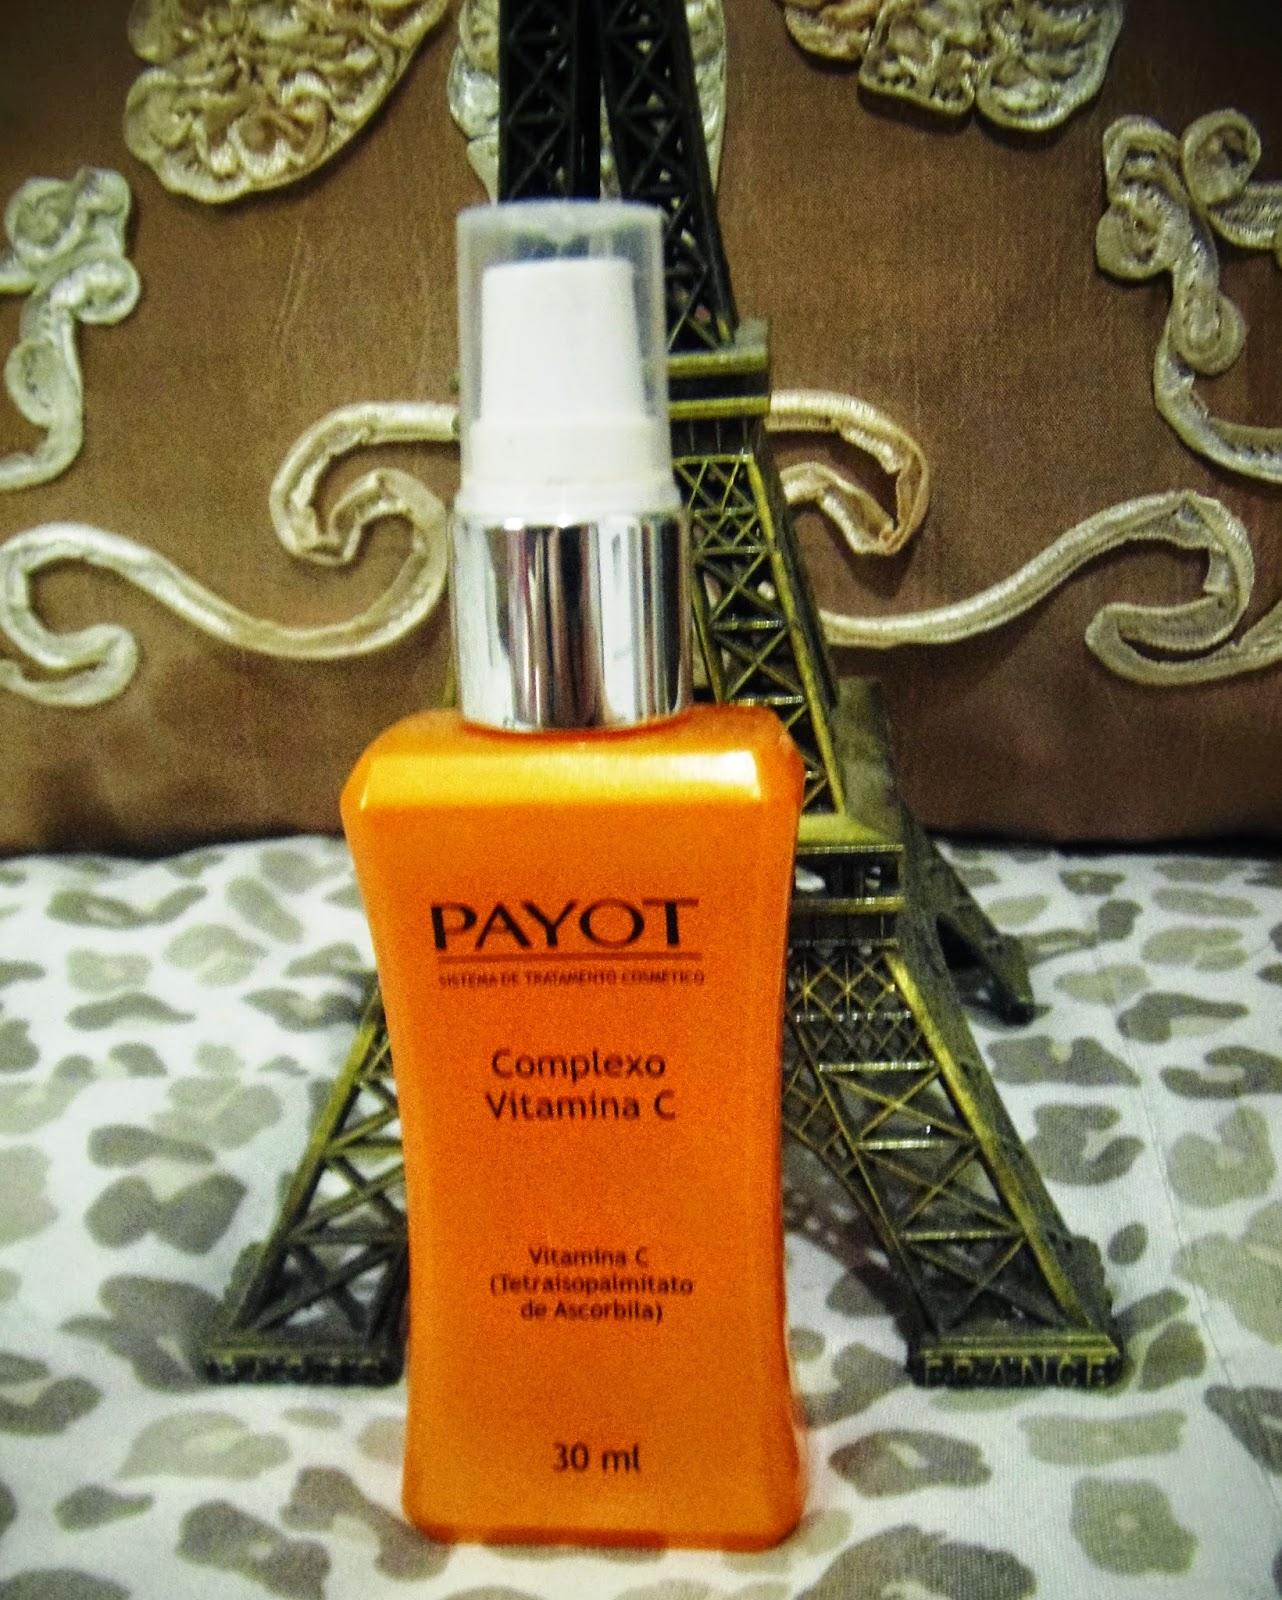 Testei!! Complexo Vitamina C da Payot